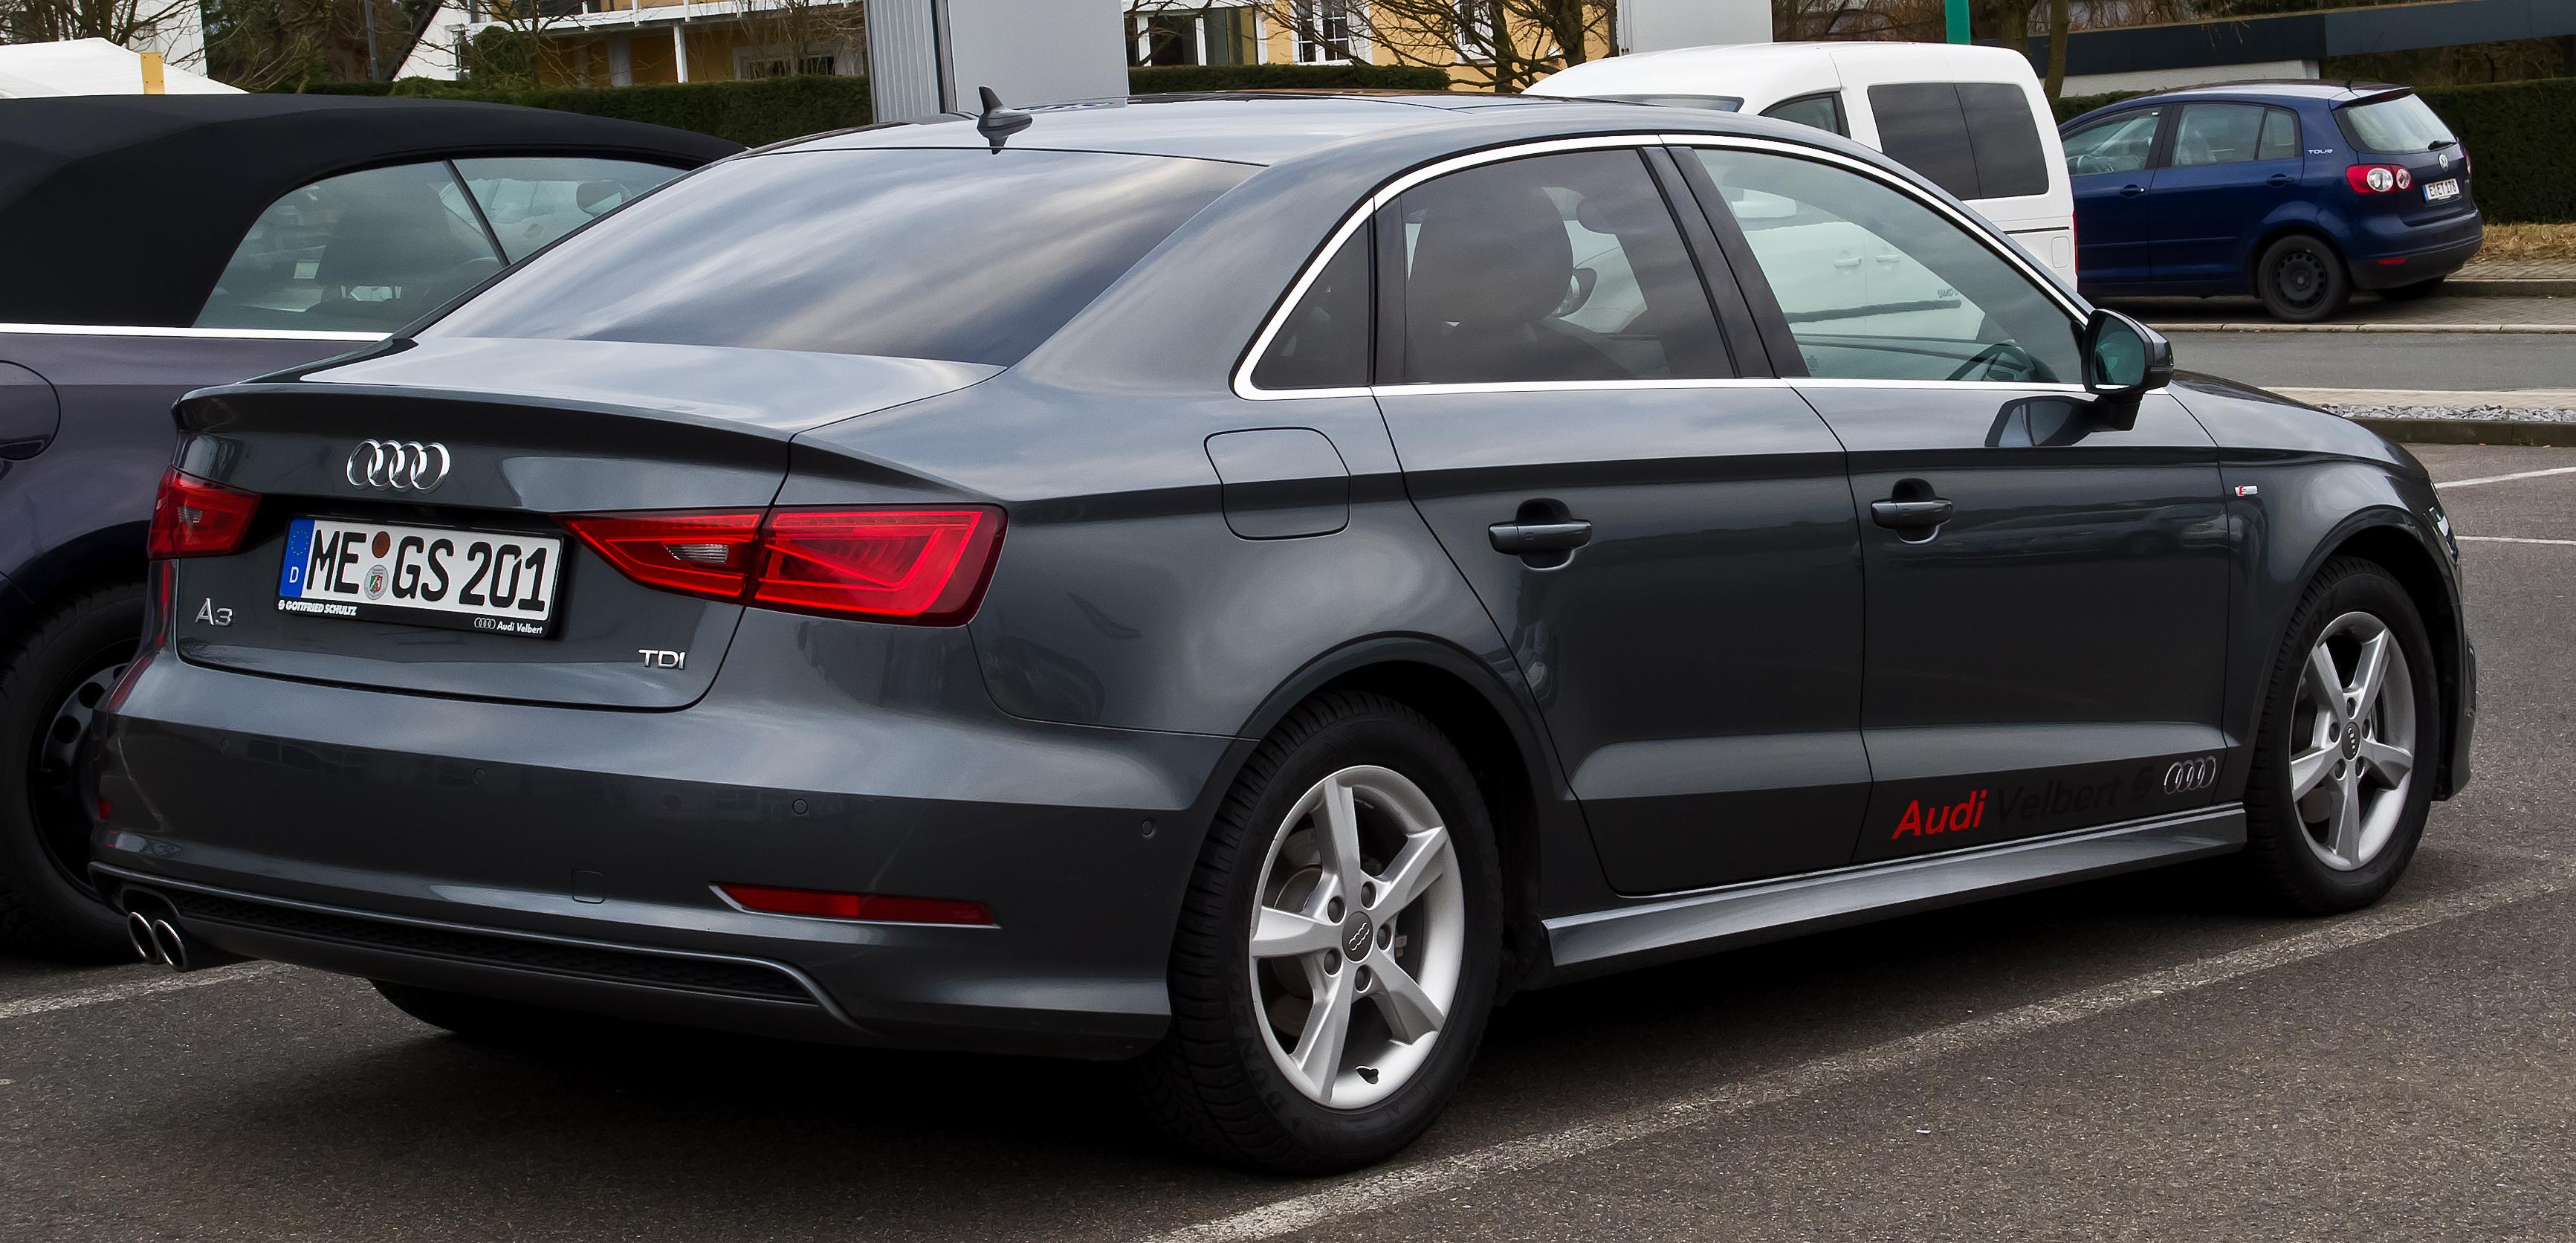 File:Audi A3 Limousine 2.0 TDI Ambiente S-line (8V) – Heckansicht, 1. März 2014, Velbert.jpg ...